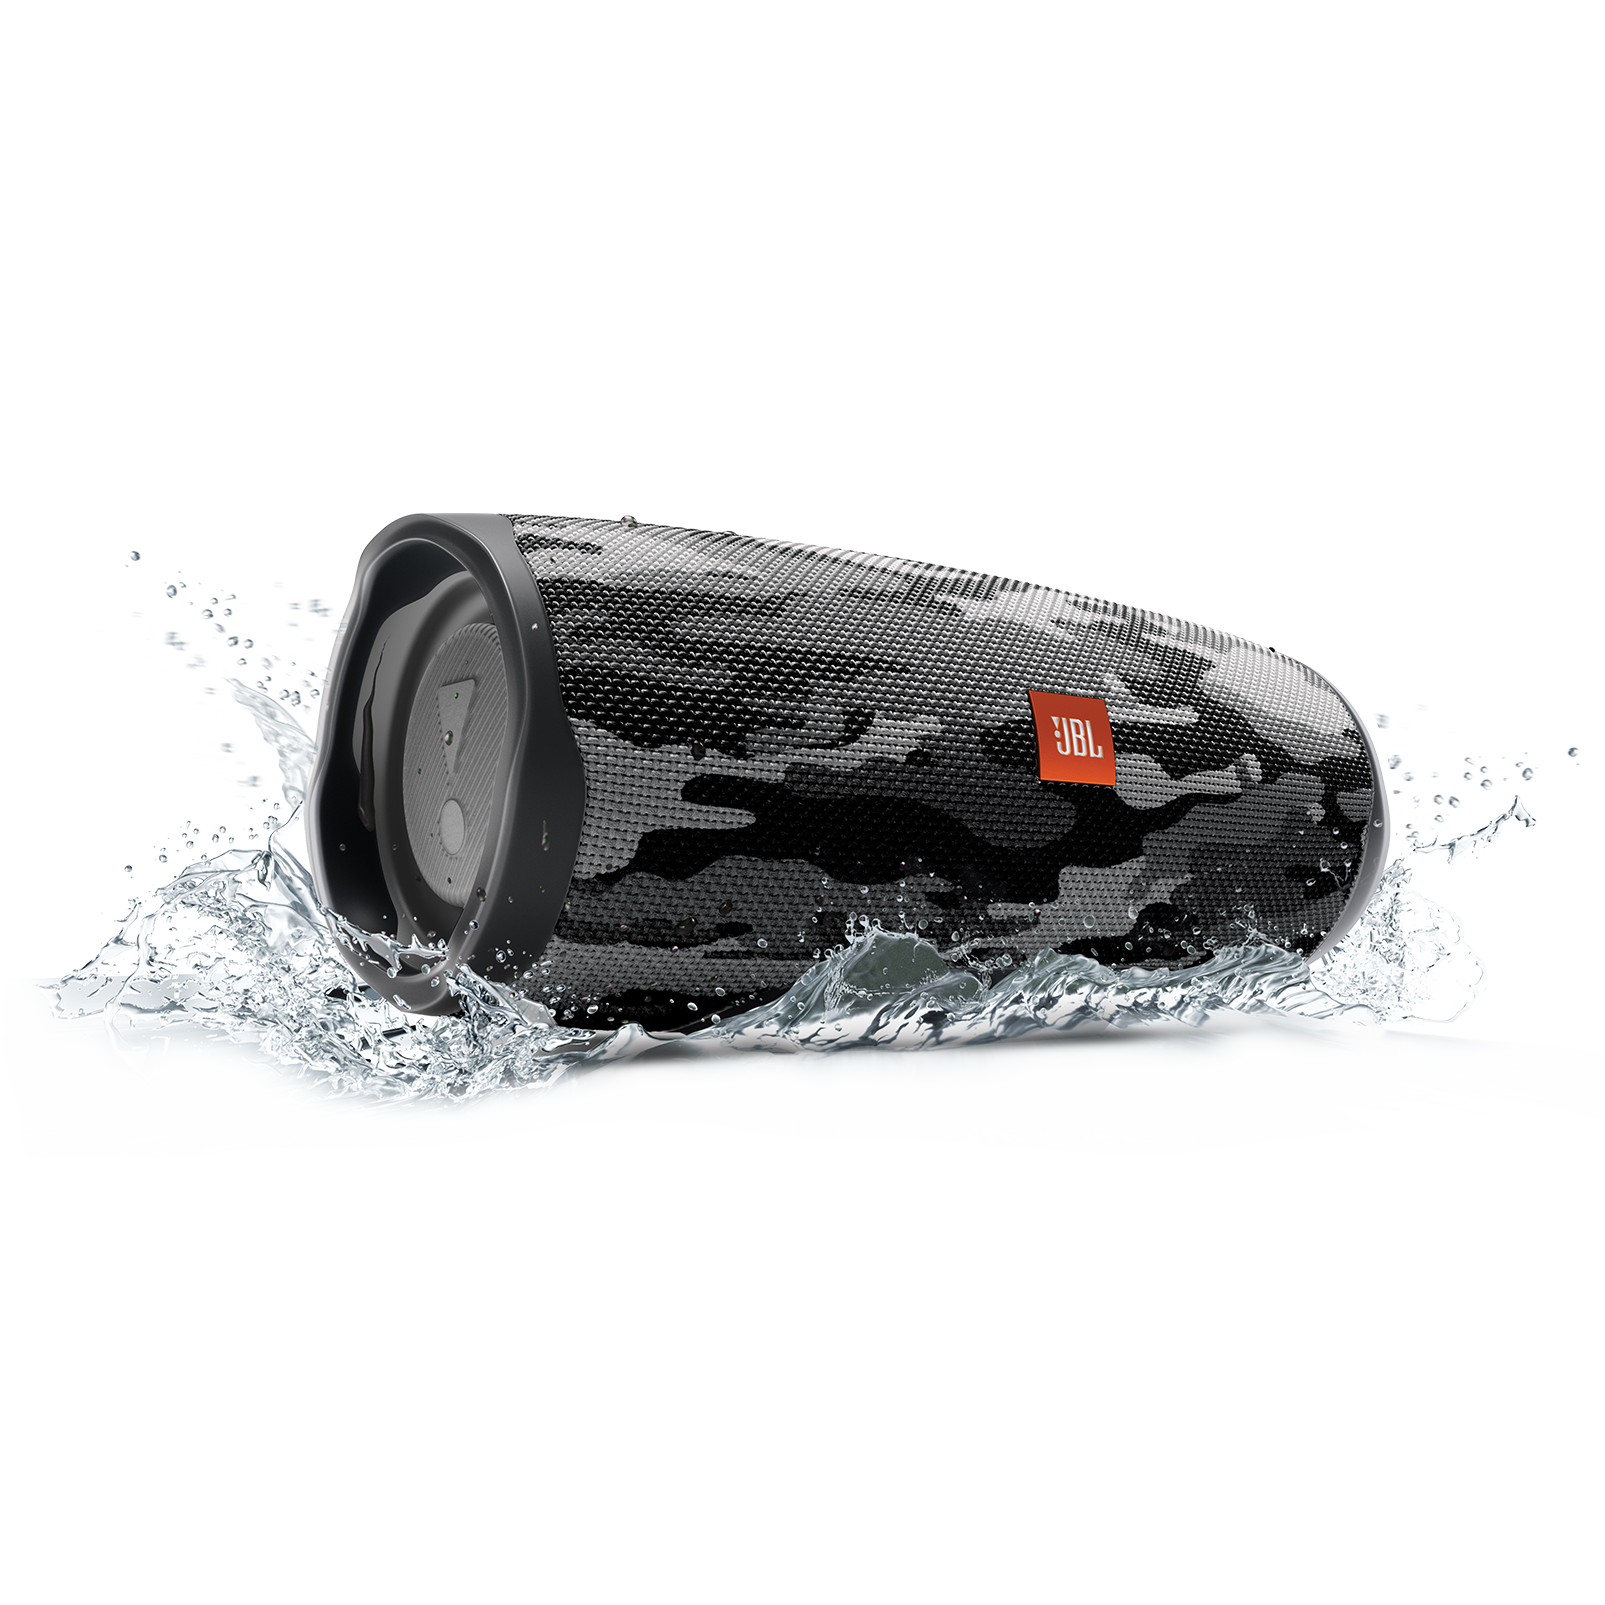 JBL Charge 4 - Black/White Camouflage - Portable Bluetooth speaker - Detailshot 5